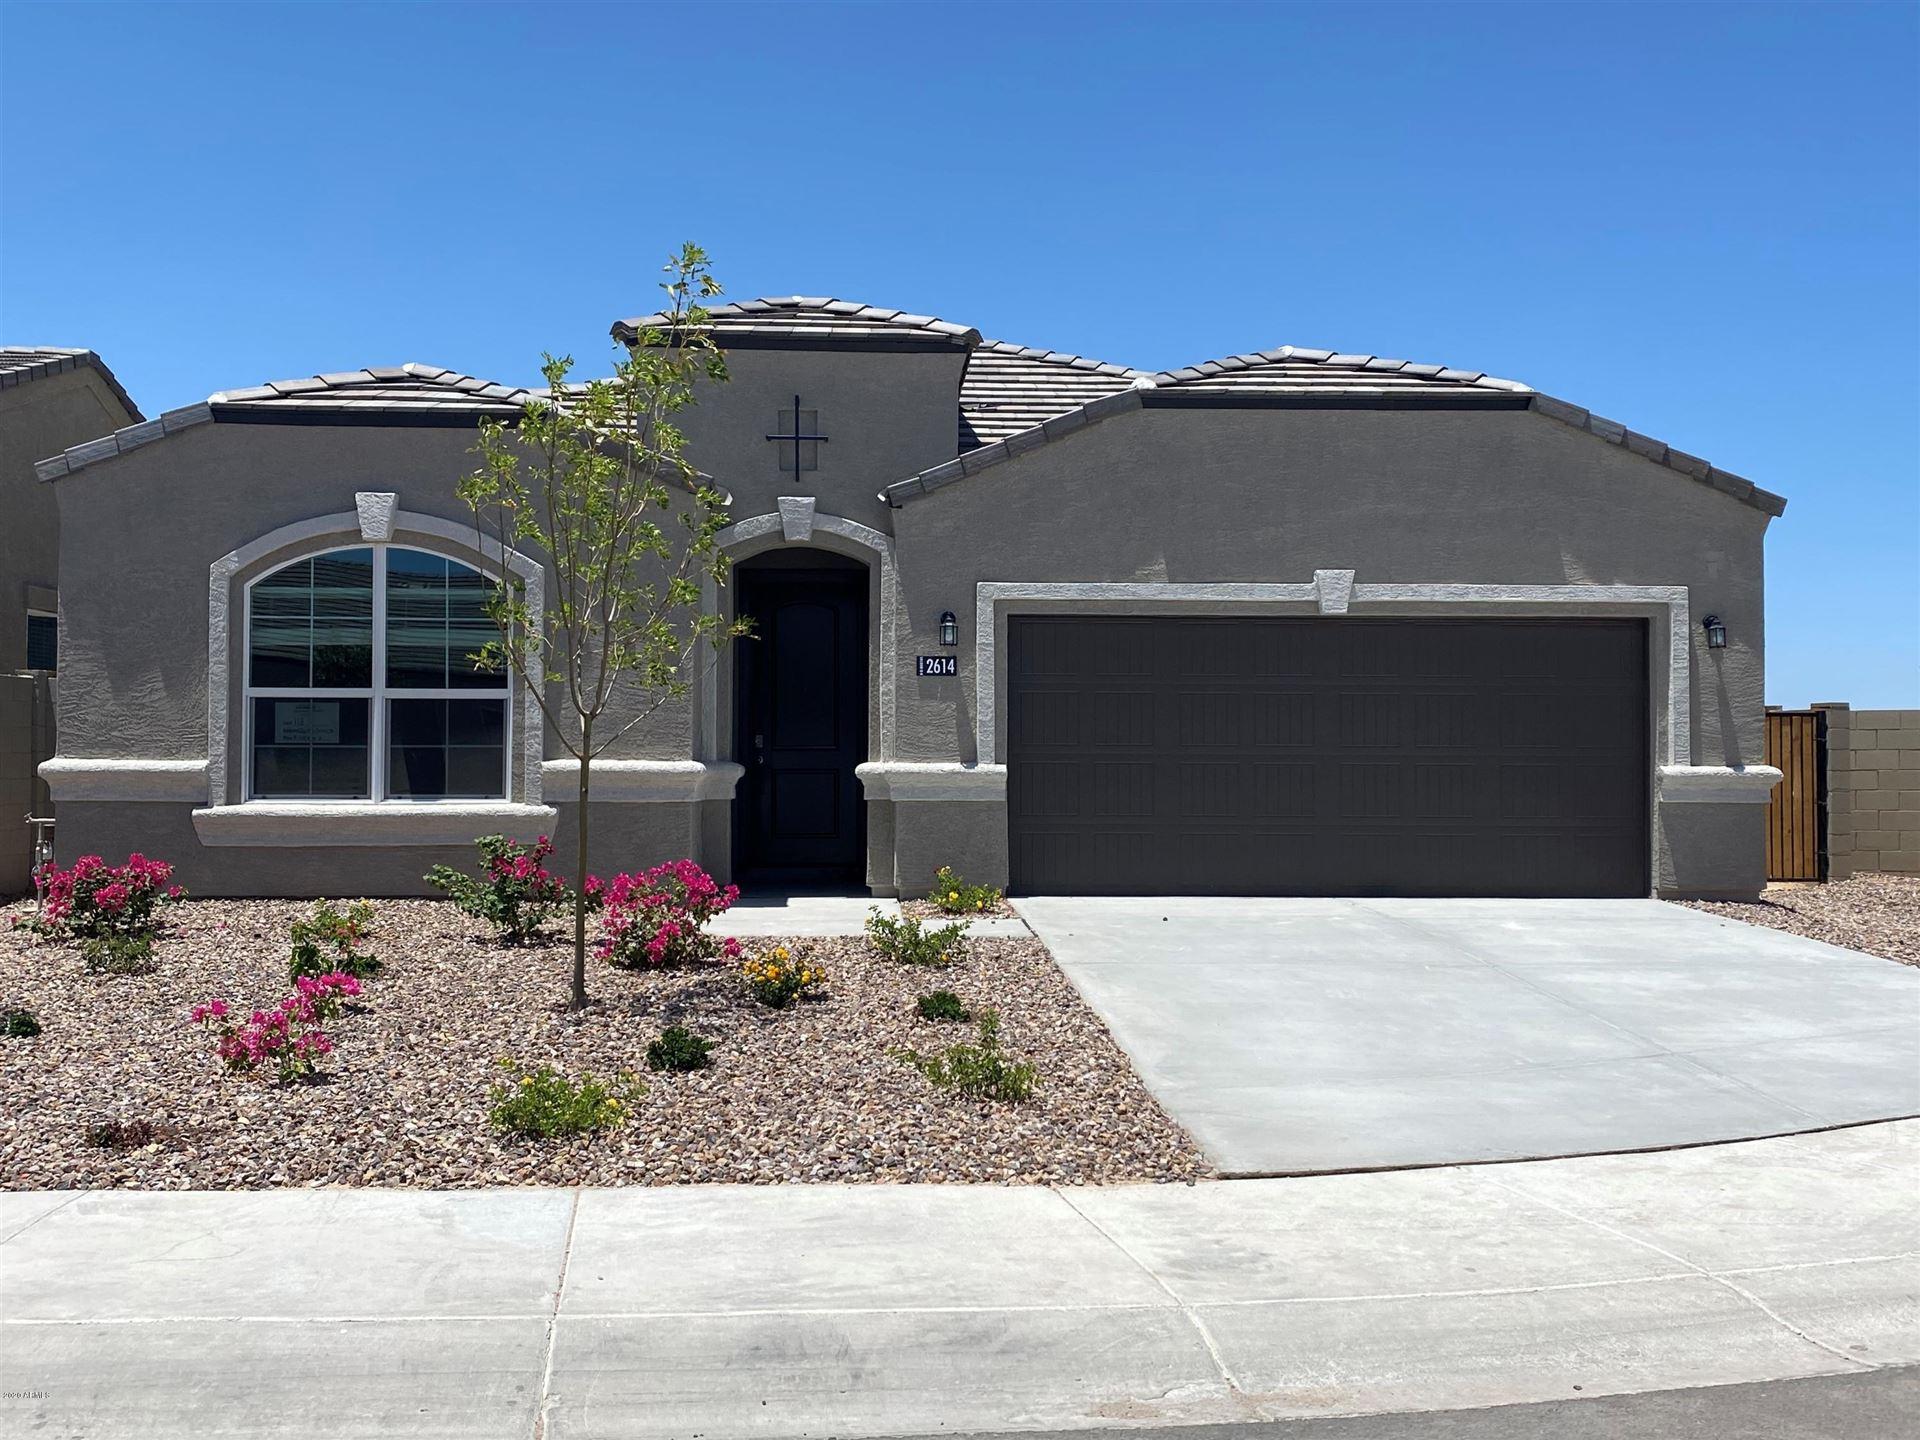 2614 N COMISKEY Drive, Florence, AZ 85132 - MLS#: 6097683